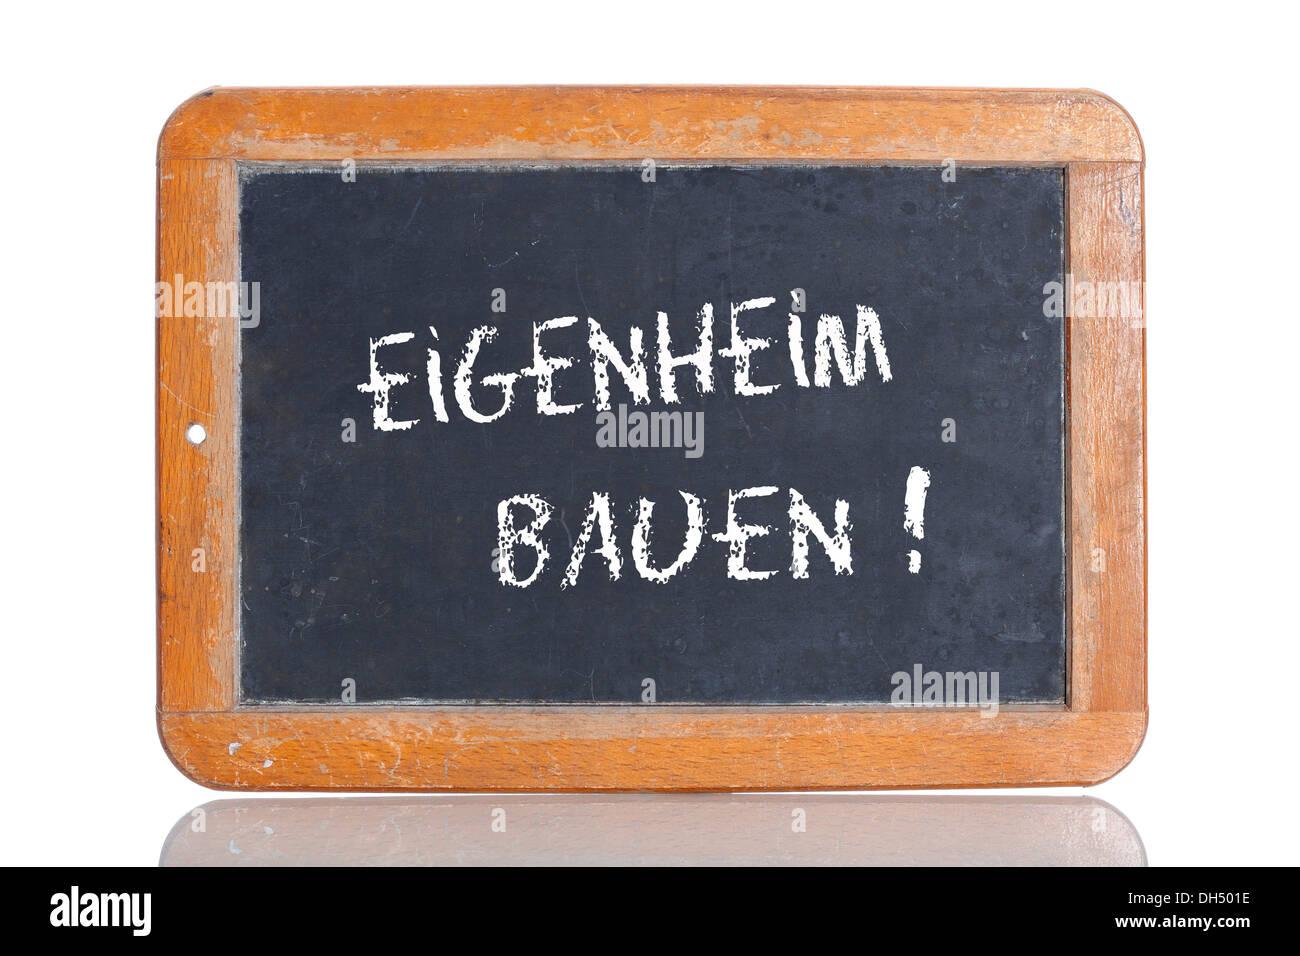 "Alte Kreidetafel, Schriftzug ""EIGENHEIM BAUEN"", Deutsch für ""BUILD A HOUSE"" Stockbild"